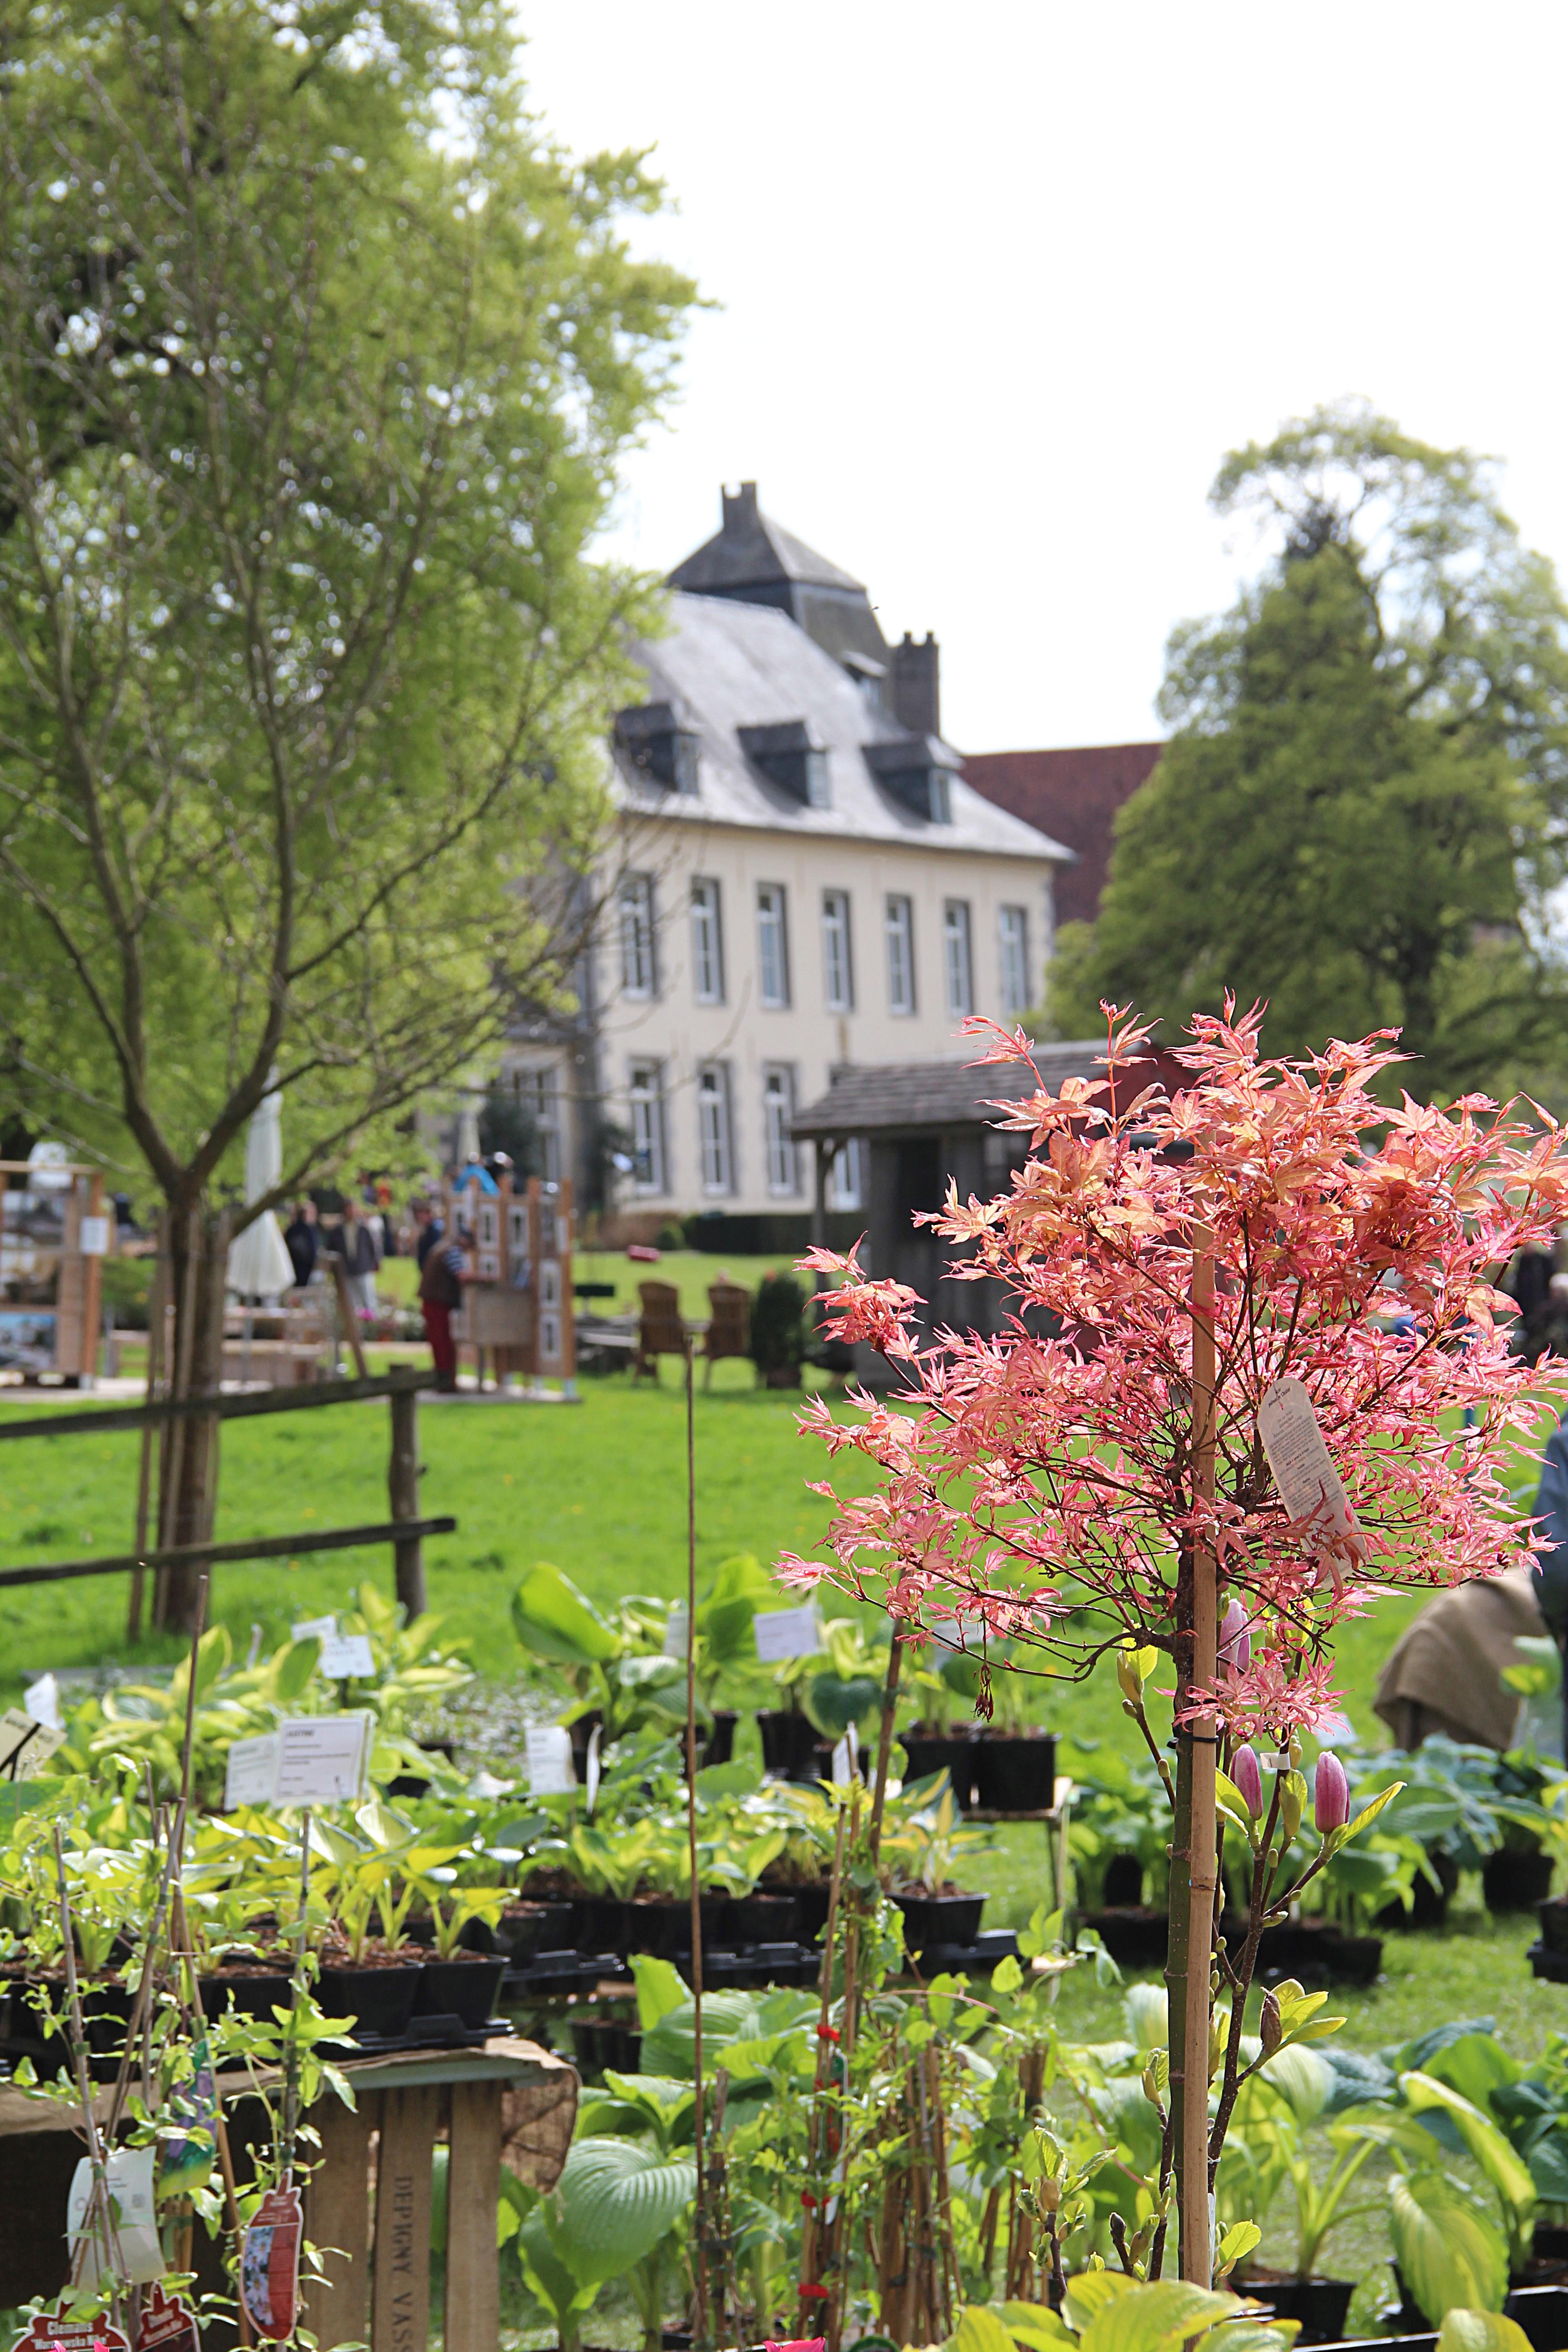 File 0 couture saint germain jardins de l 39 abbaye d for Jardin d aywiers 2016